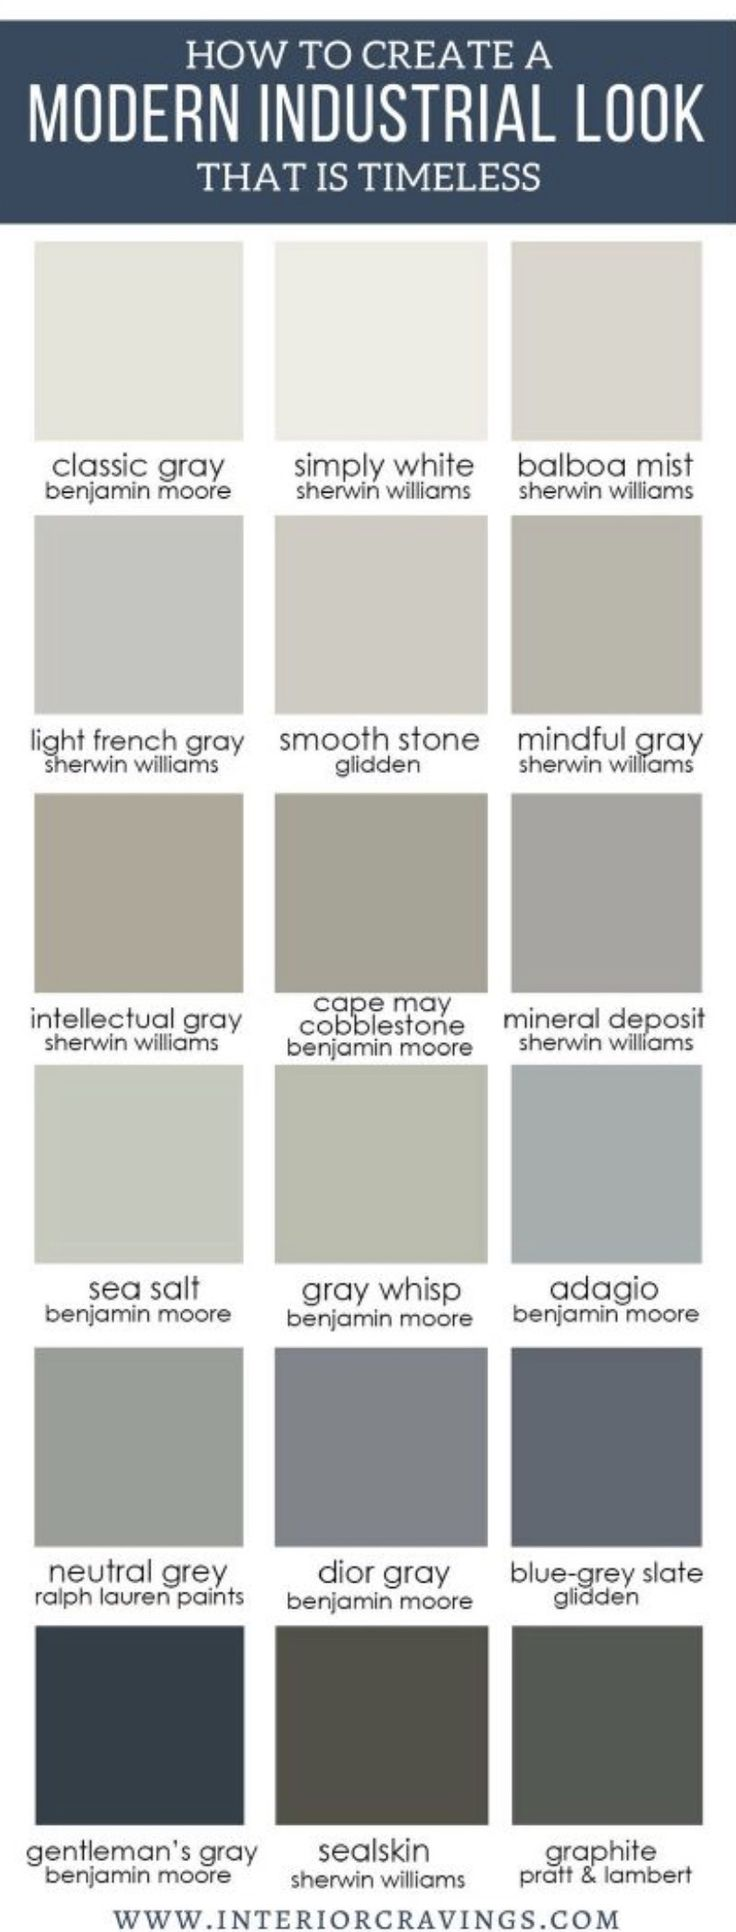 Industrial paint colors in 2020 exterior paint colors